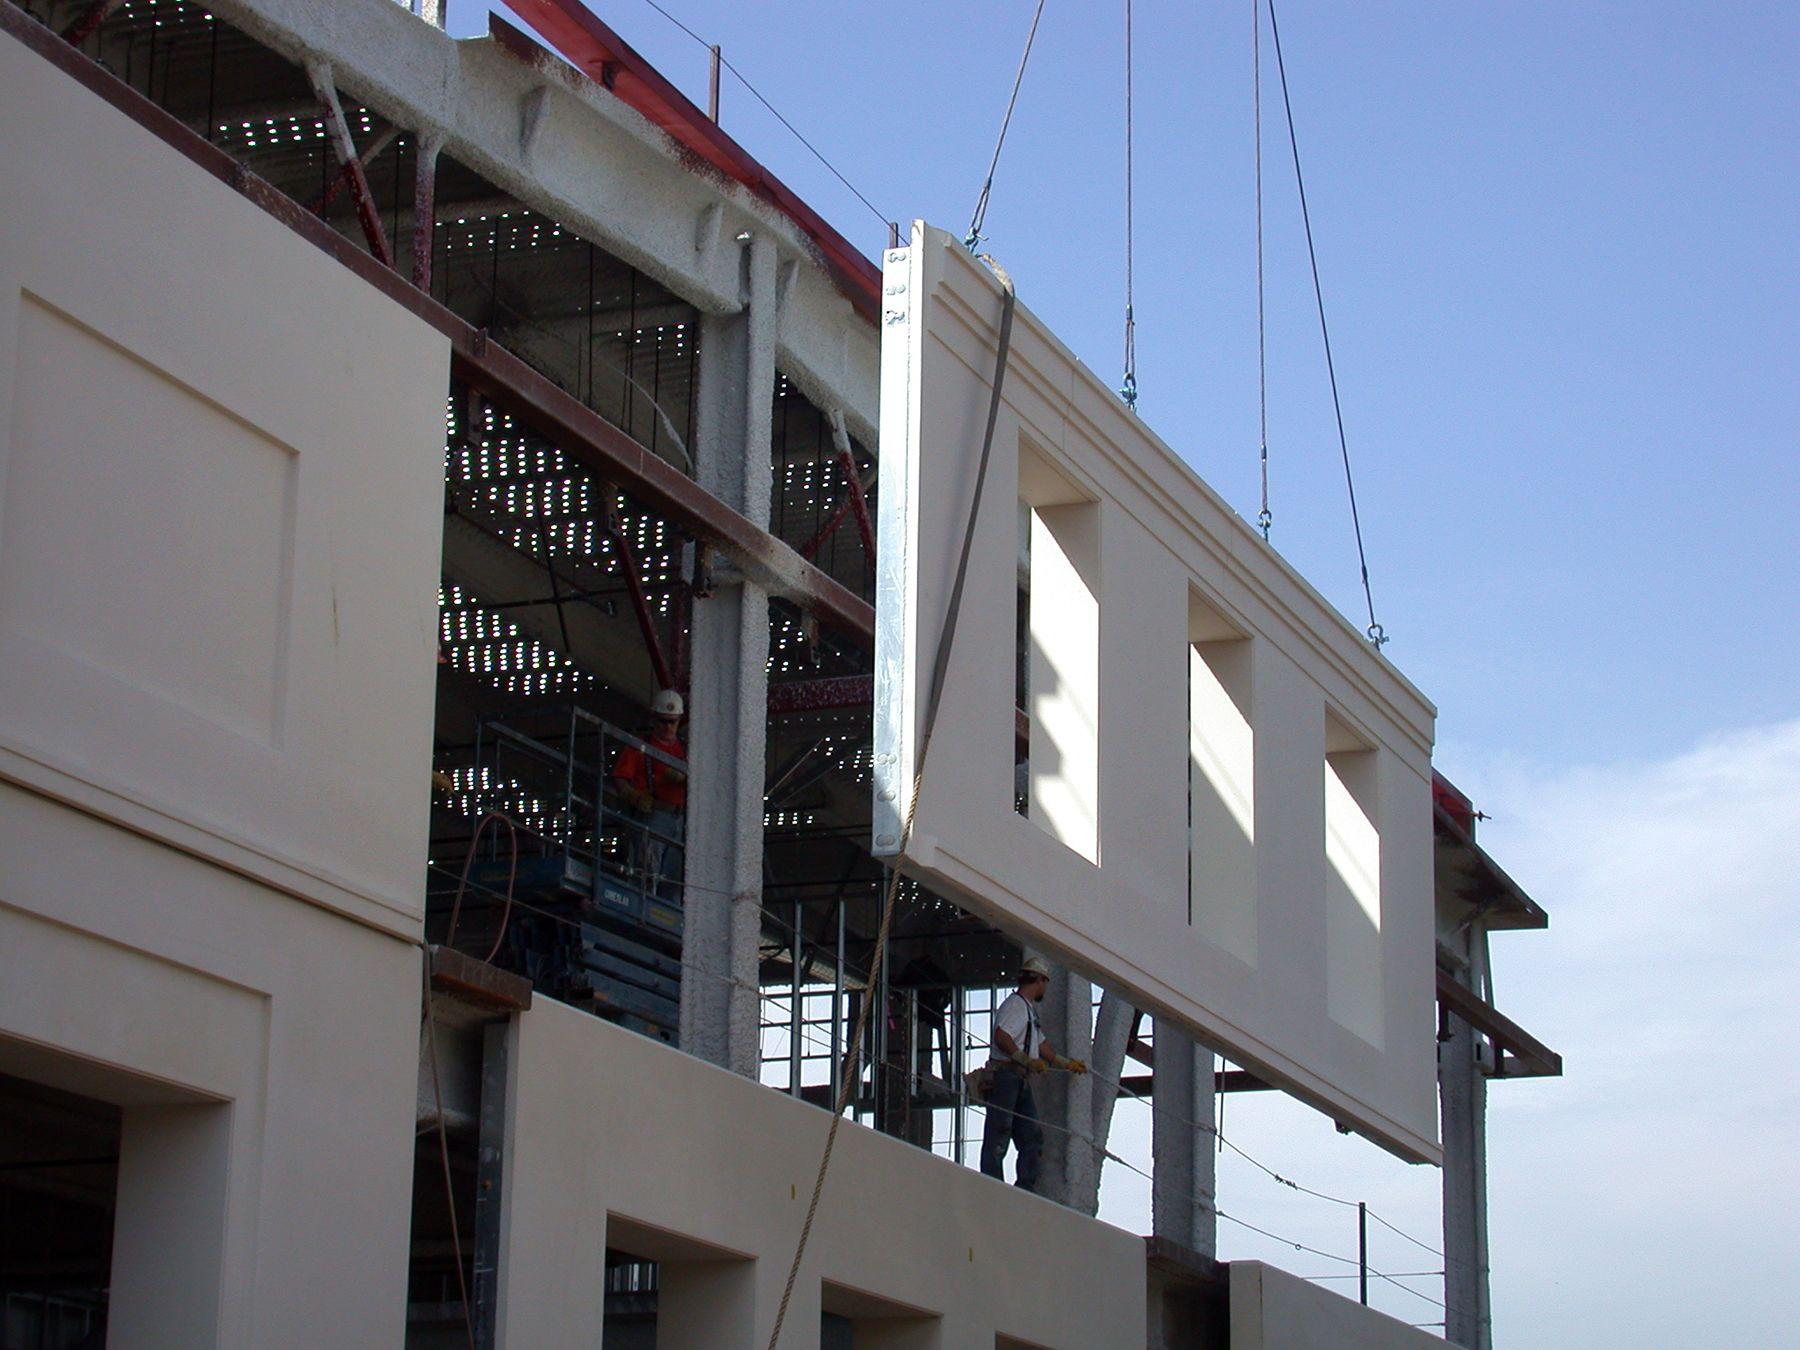 Eps Foam Used As Insulation In Precast Concrete Wall Panels Polymolding Llc In 2020 Precast Concrete Concrete Wall Panels Prefab Walls